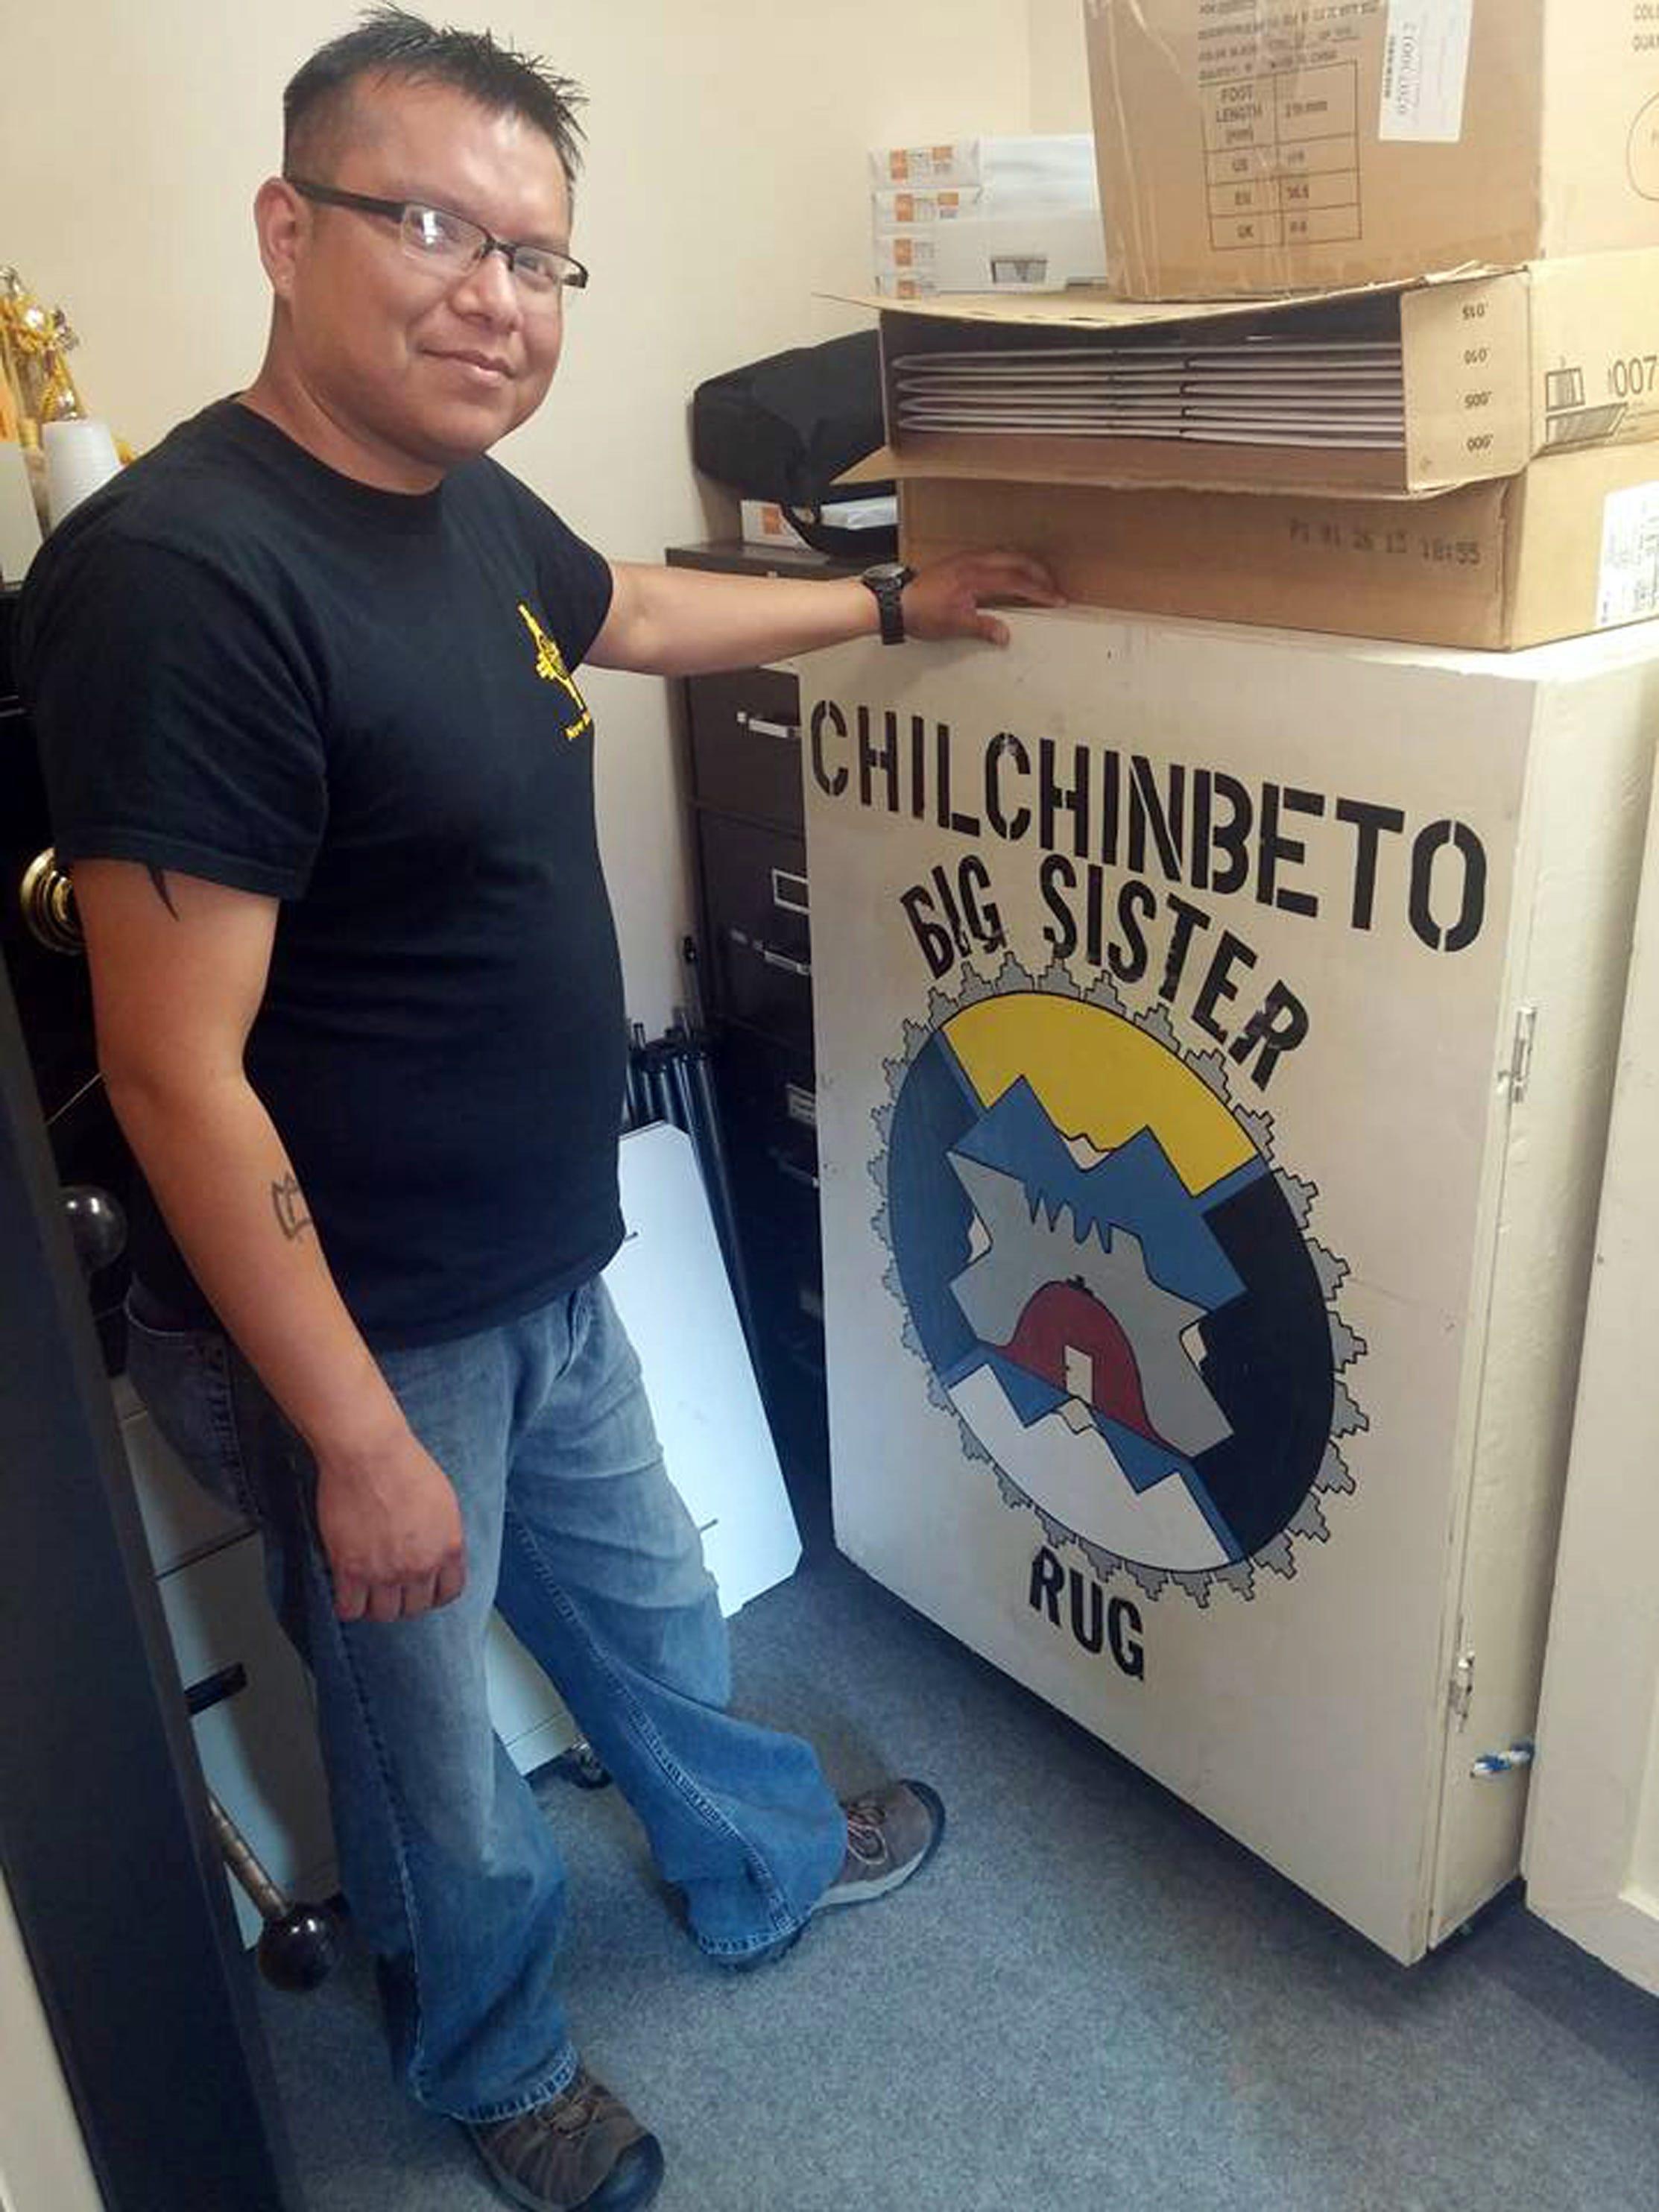 Filmmaker Dwayne Joe Poses With The Box Where The Big